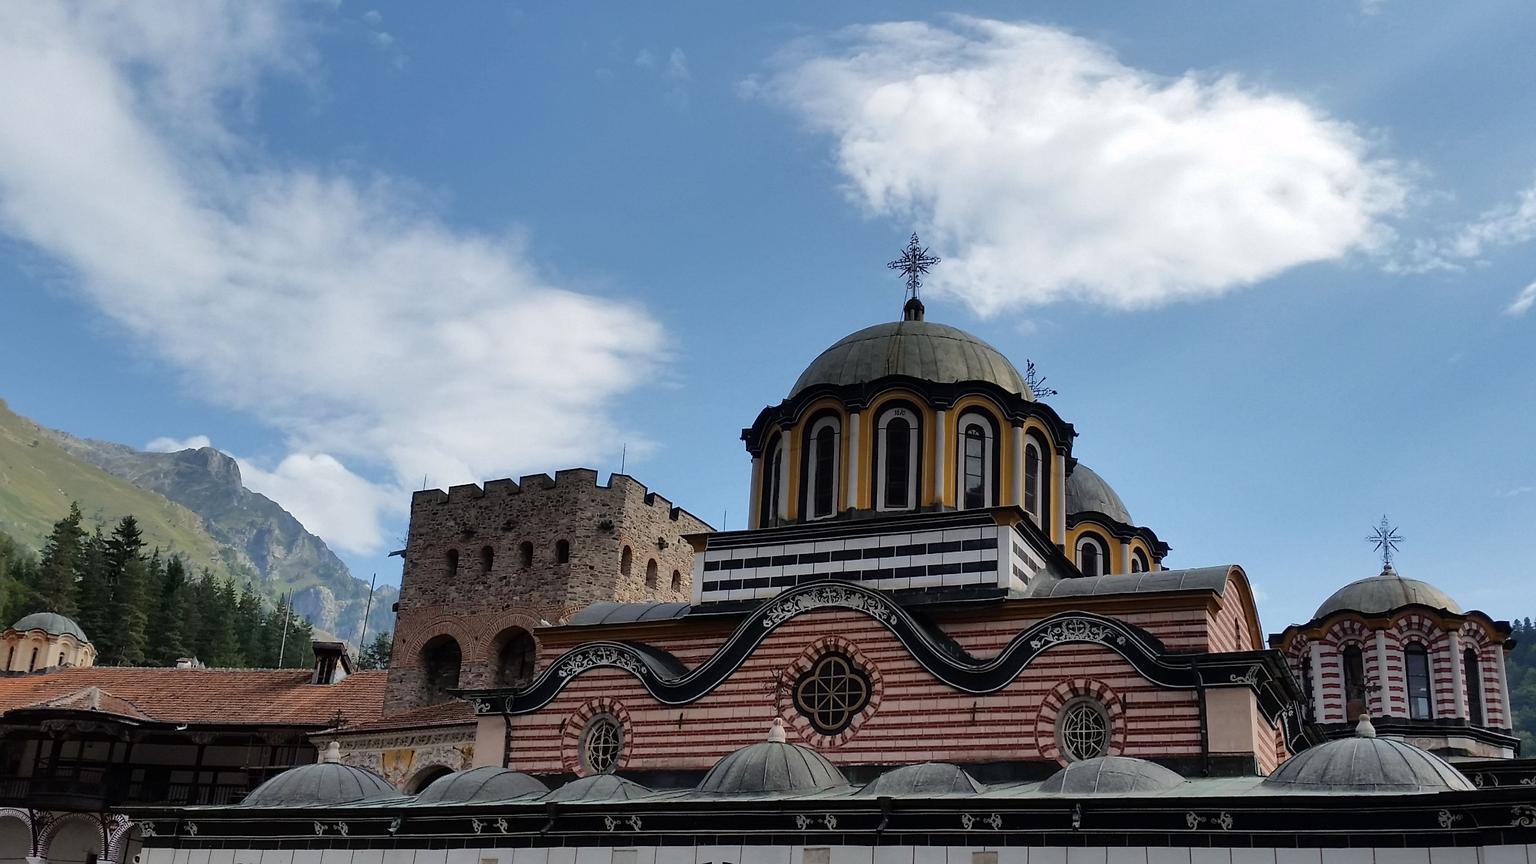 MÁS FOTOS, Monasterio de Rila e iglesia de Boyana con almuerzo ligero